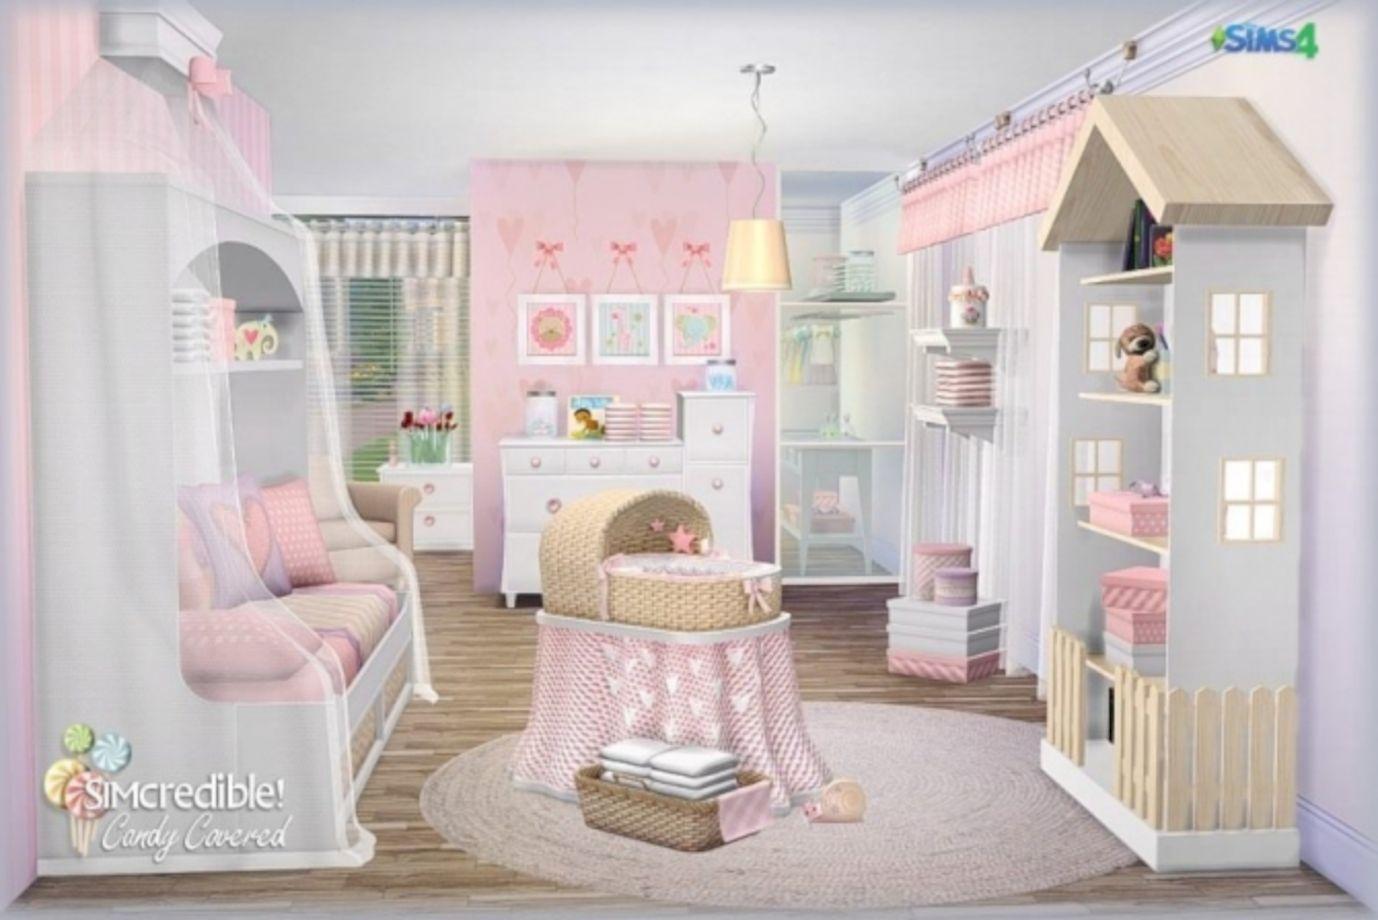 60 Cute and Simple Kids Bedroom Furniture Designs Ideas